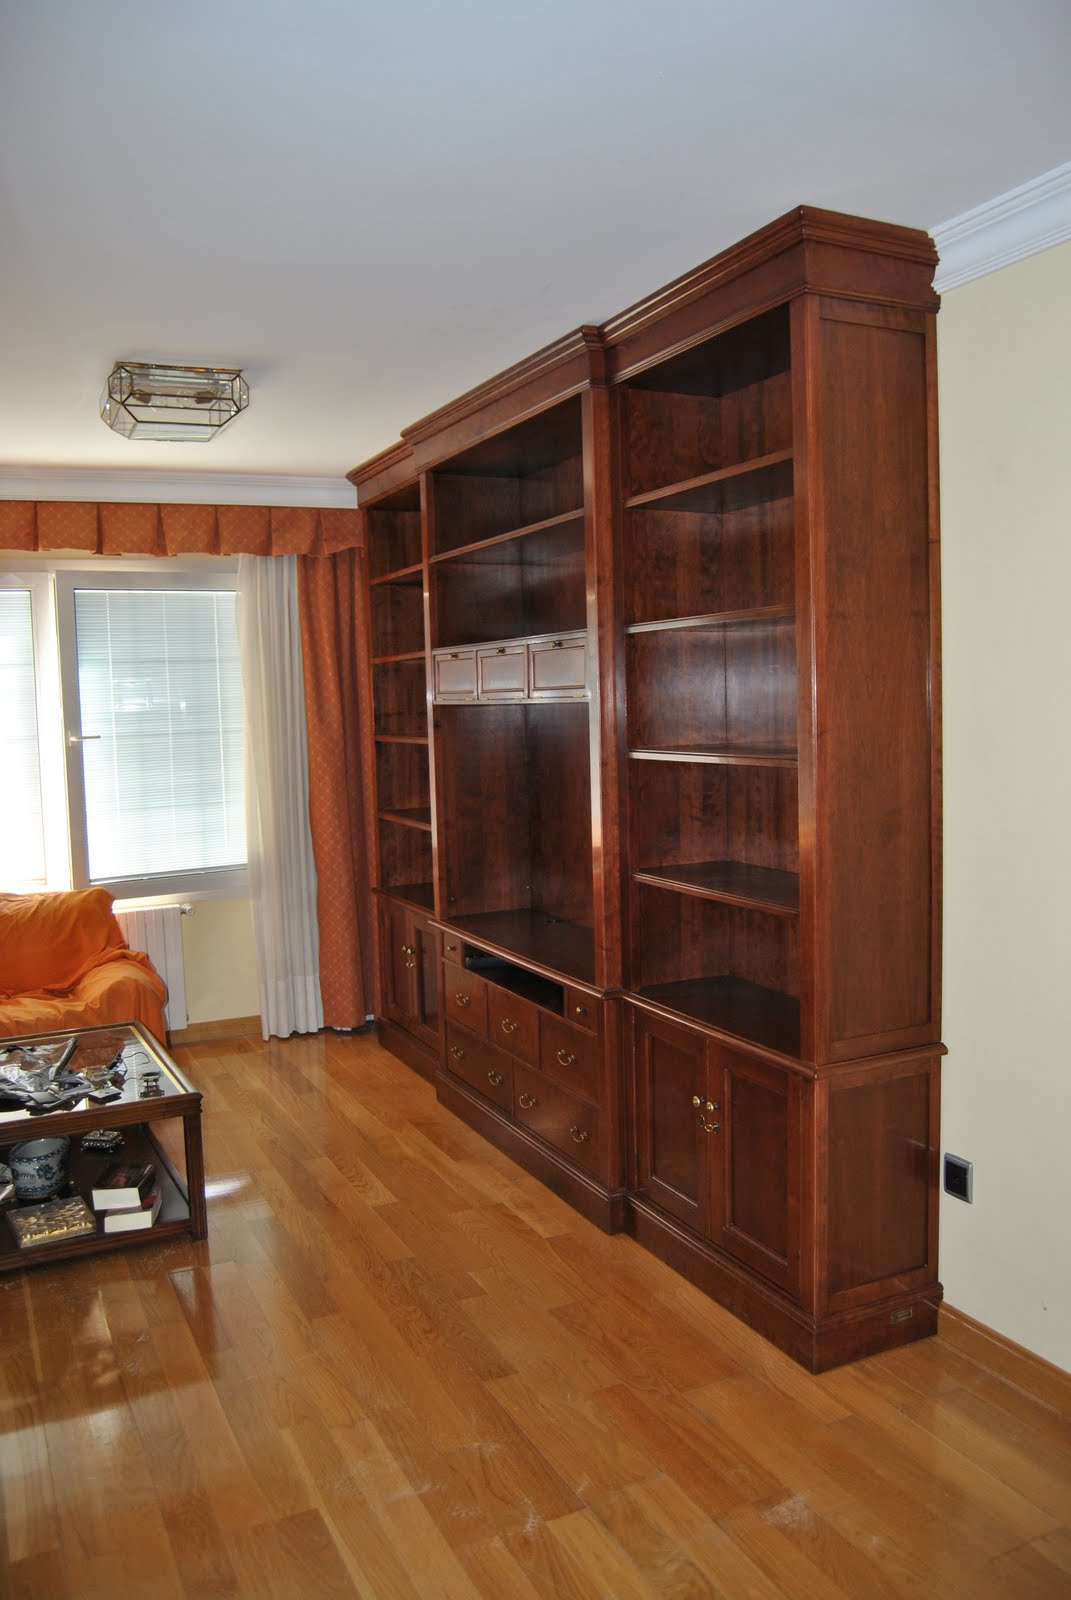 Ebanista mueble de sal n a medida for Medidas mueble salon